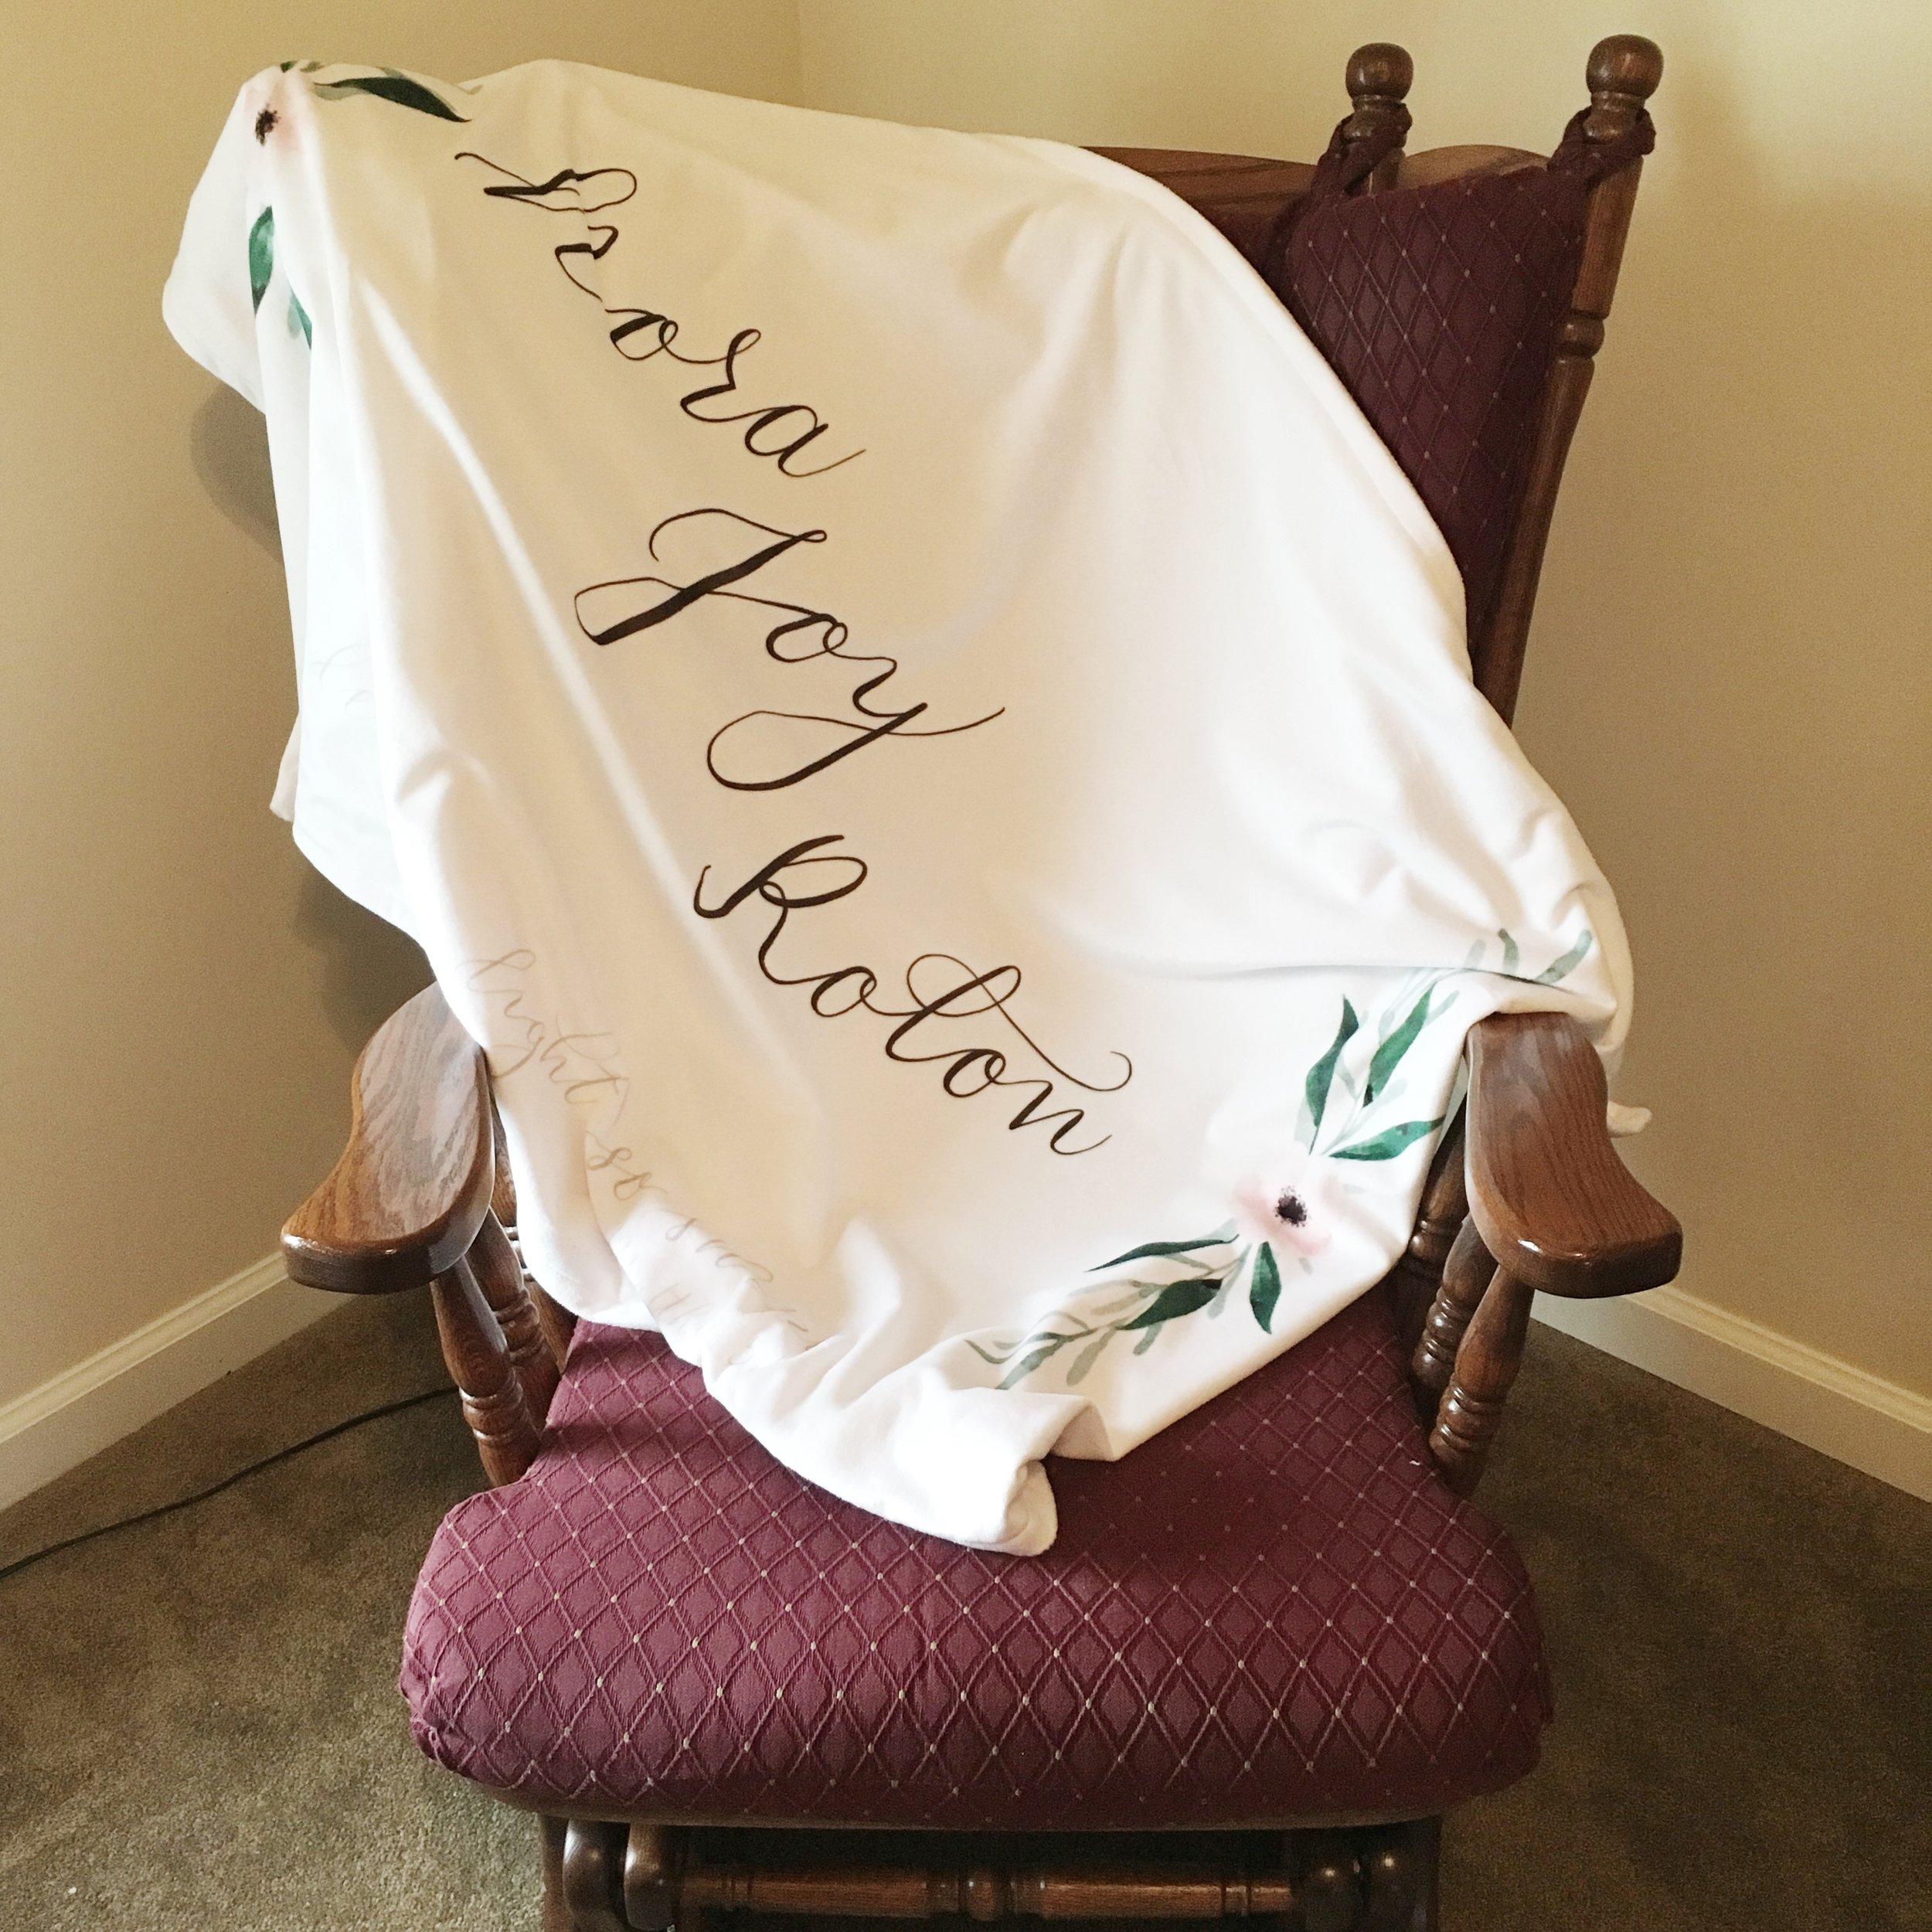 Central PA, Baby Blanket, Hand lettered, JesSmith Designs, Invitations, custom-04-03 17.10.51.jpg